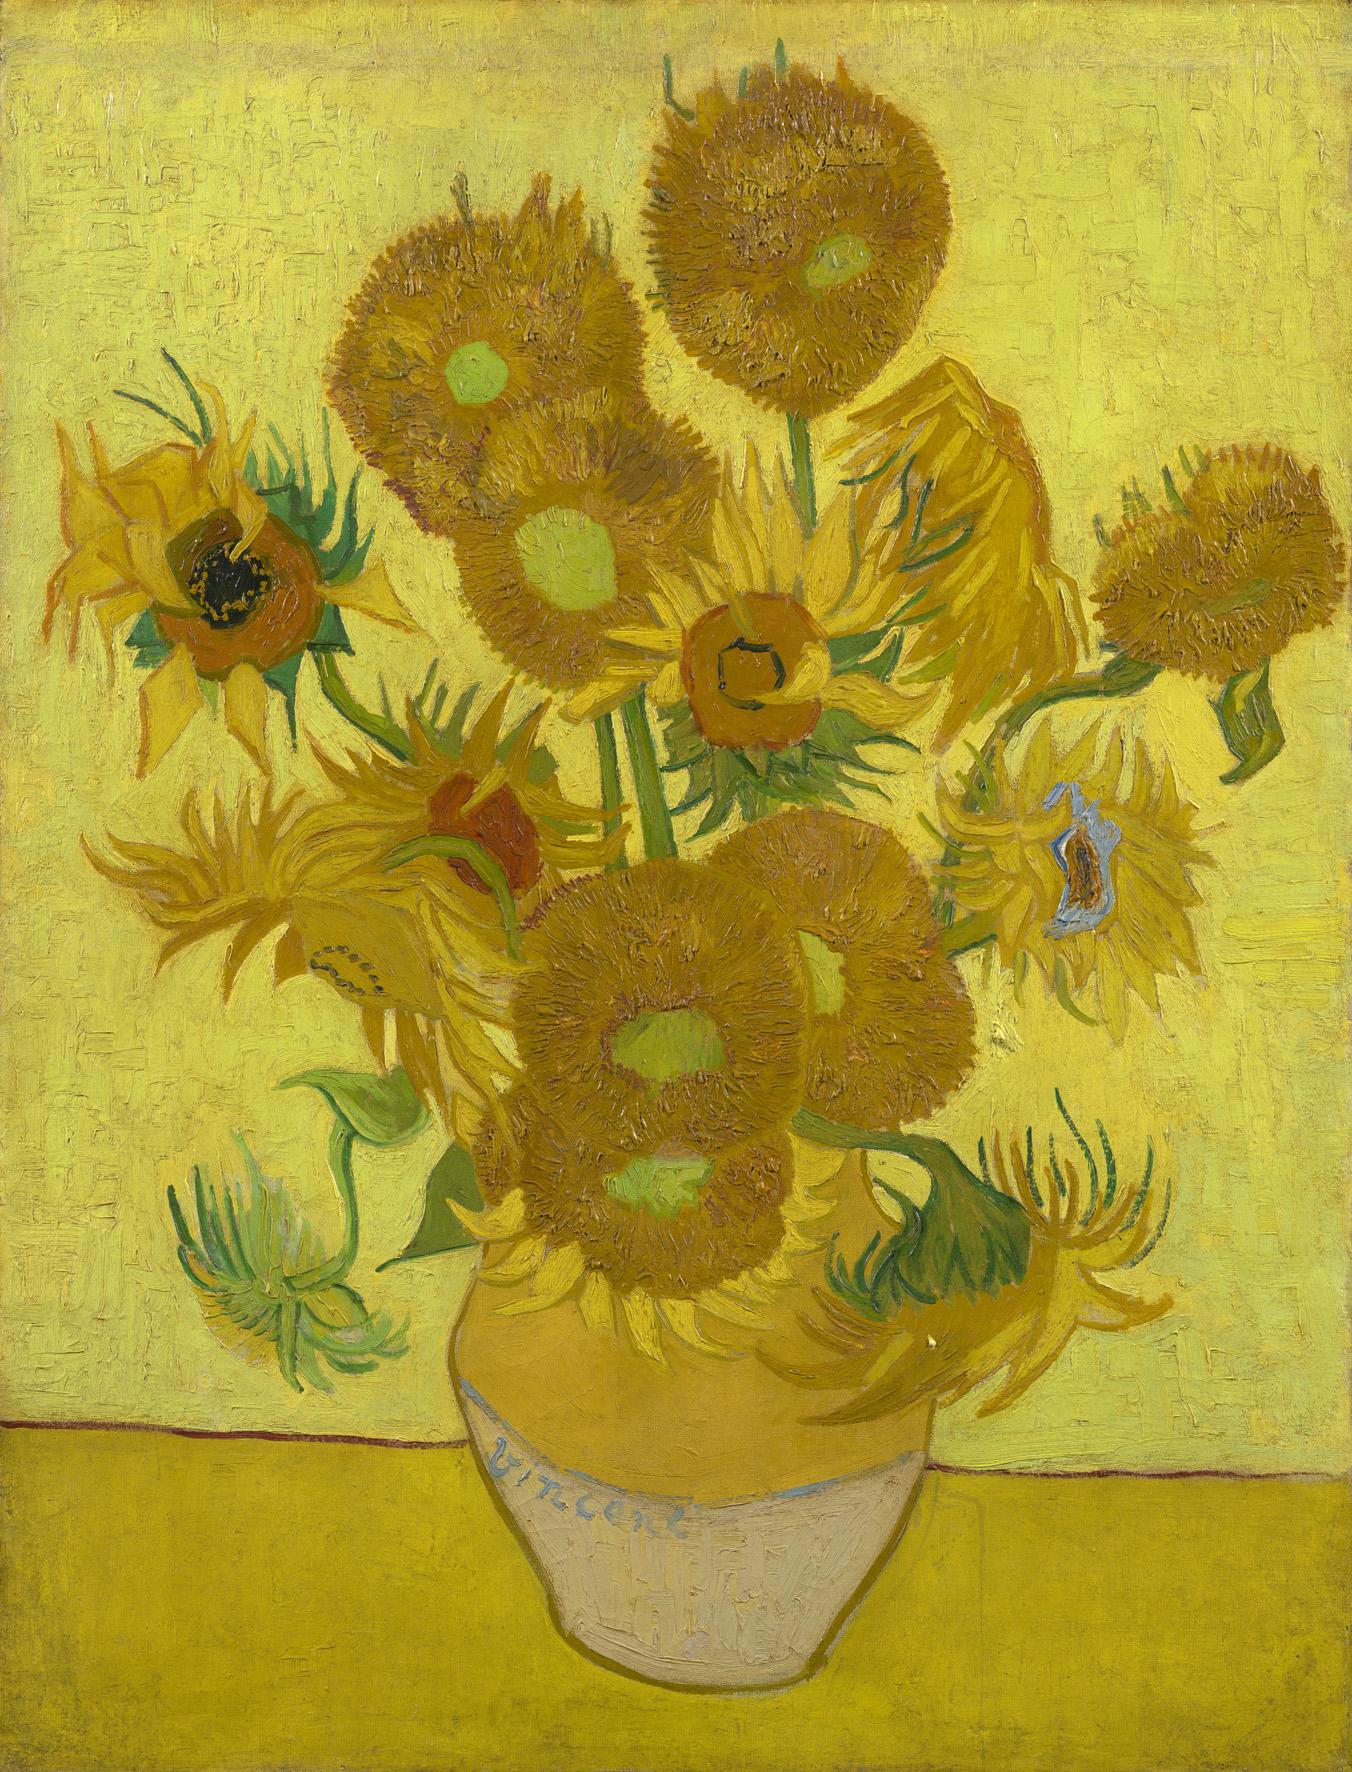 2013-10-29-SunflowersL1162.pr.jpg